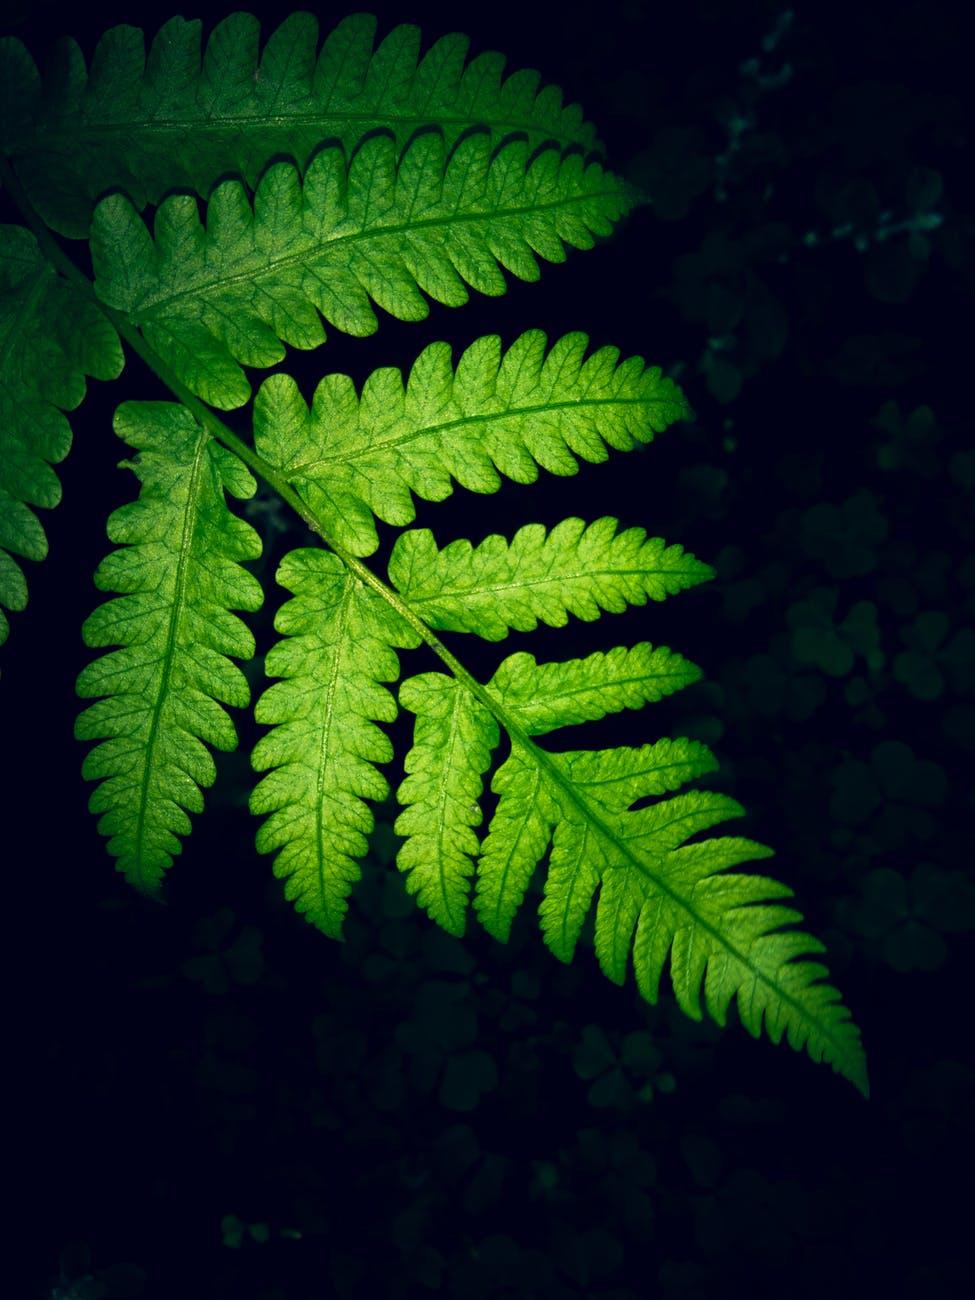 close up photo of green fern leaf